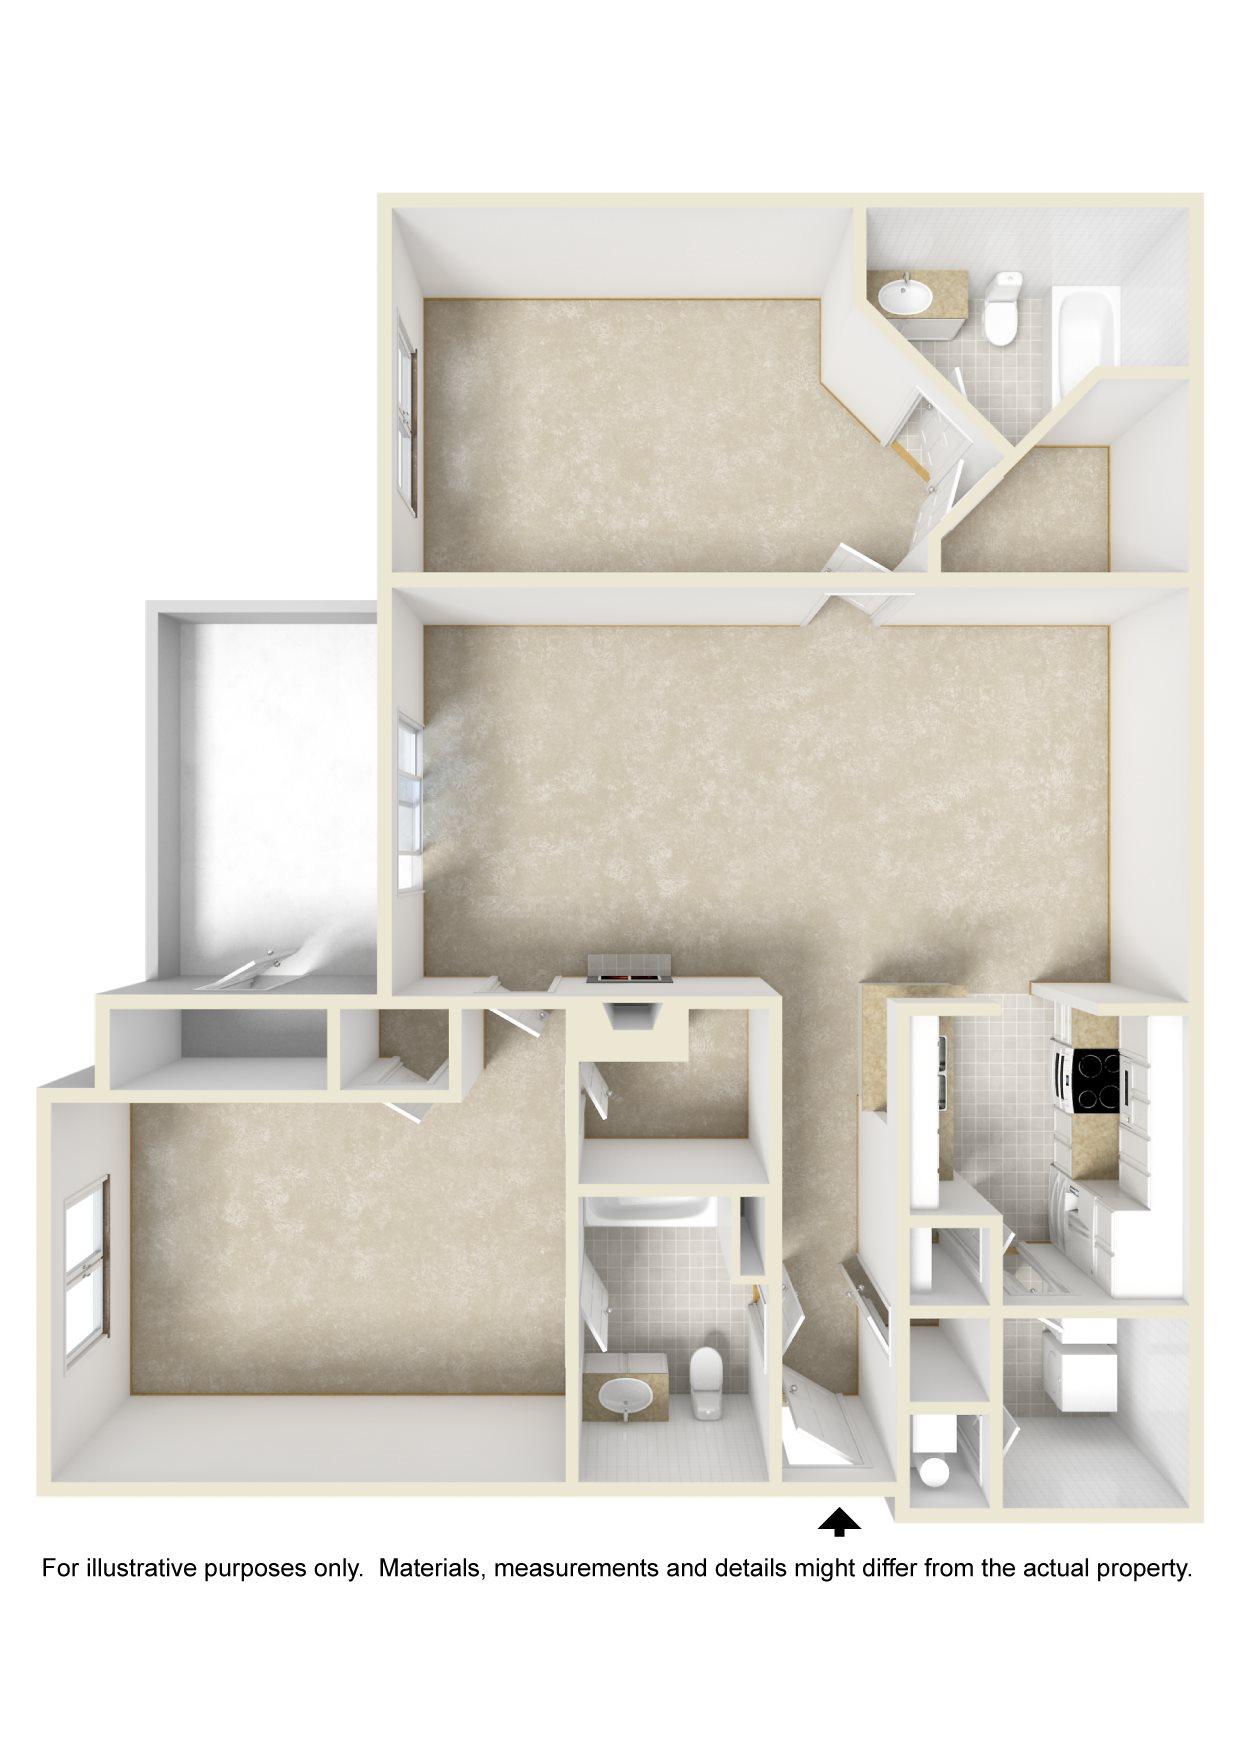 The Cancun Floor Plan 2